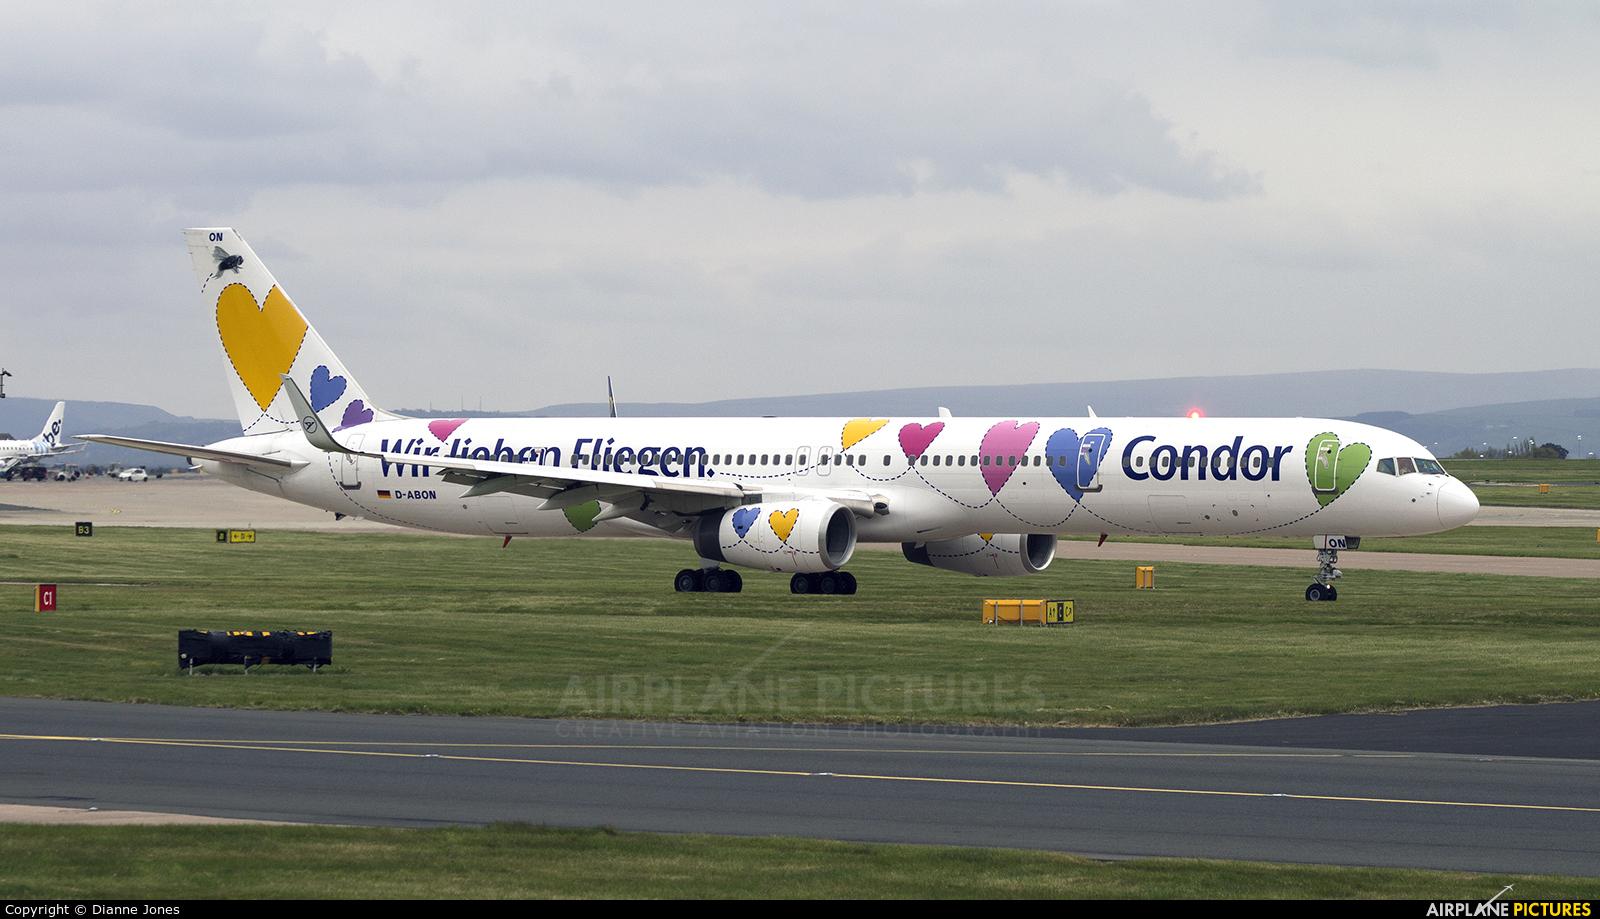 Condor D-ABON aircraft at Manchester